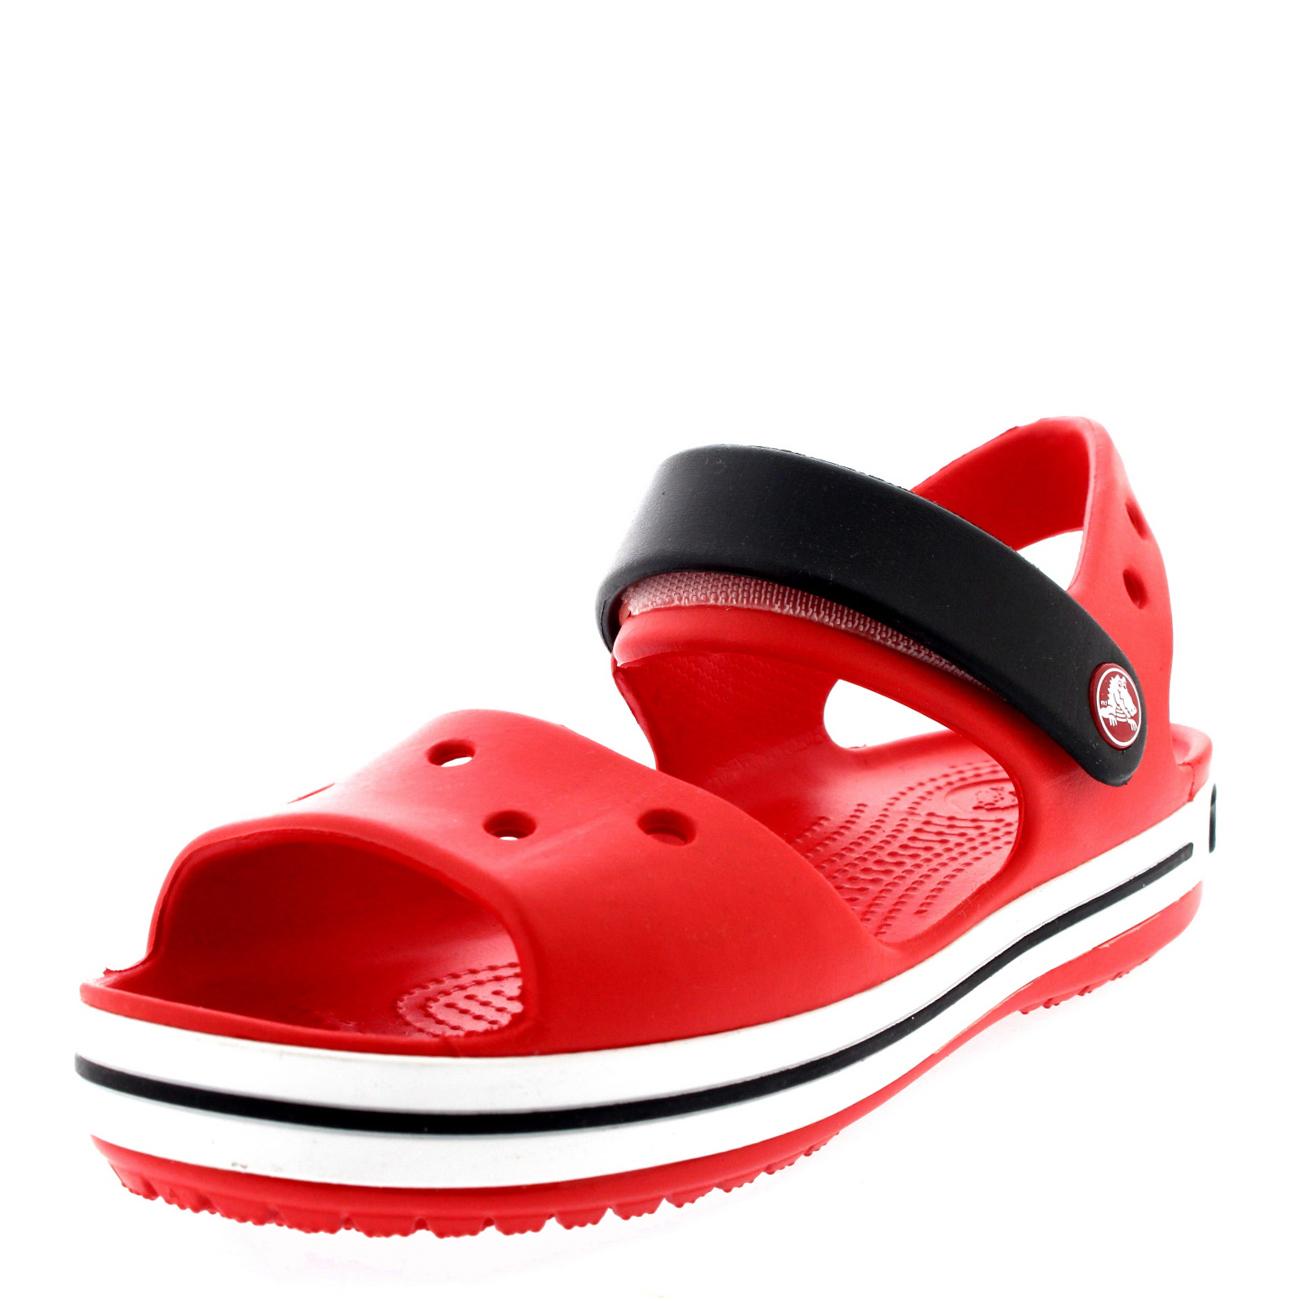 ccbf714c4b5ee Details about Unisex Kids Crocs Crocband Pool Lightweight Sandal Summer  Beach Sandals US 1-6